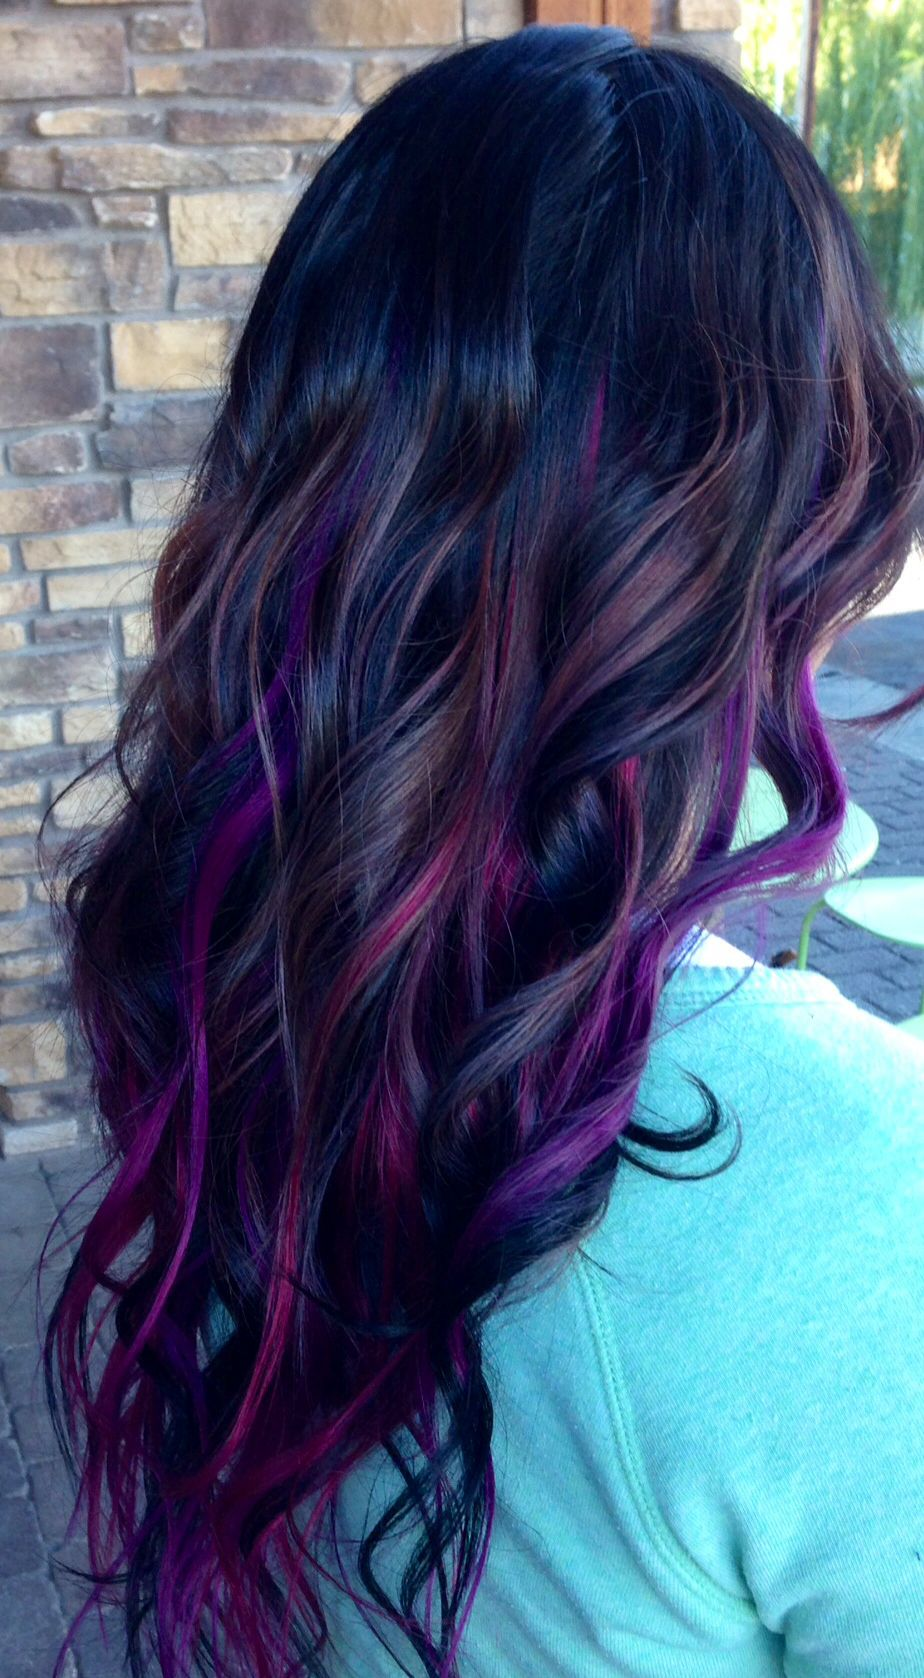 Hair And Makeup Designs Done By Jaidyn Perkins Purple Balayage